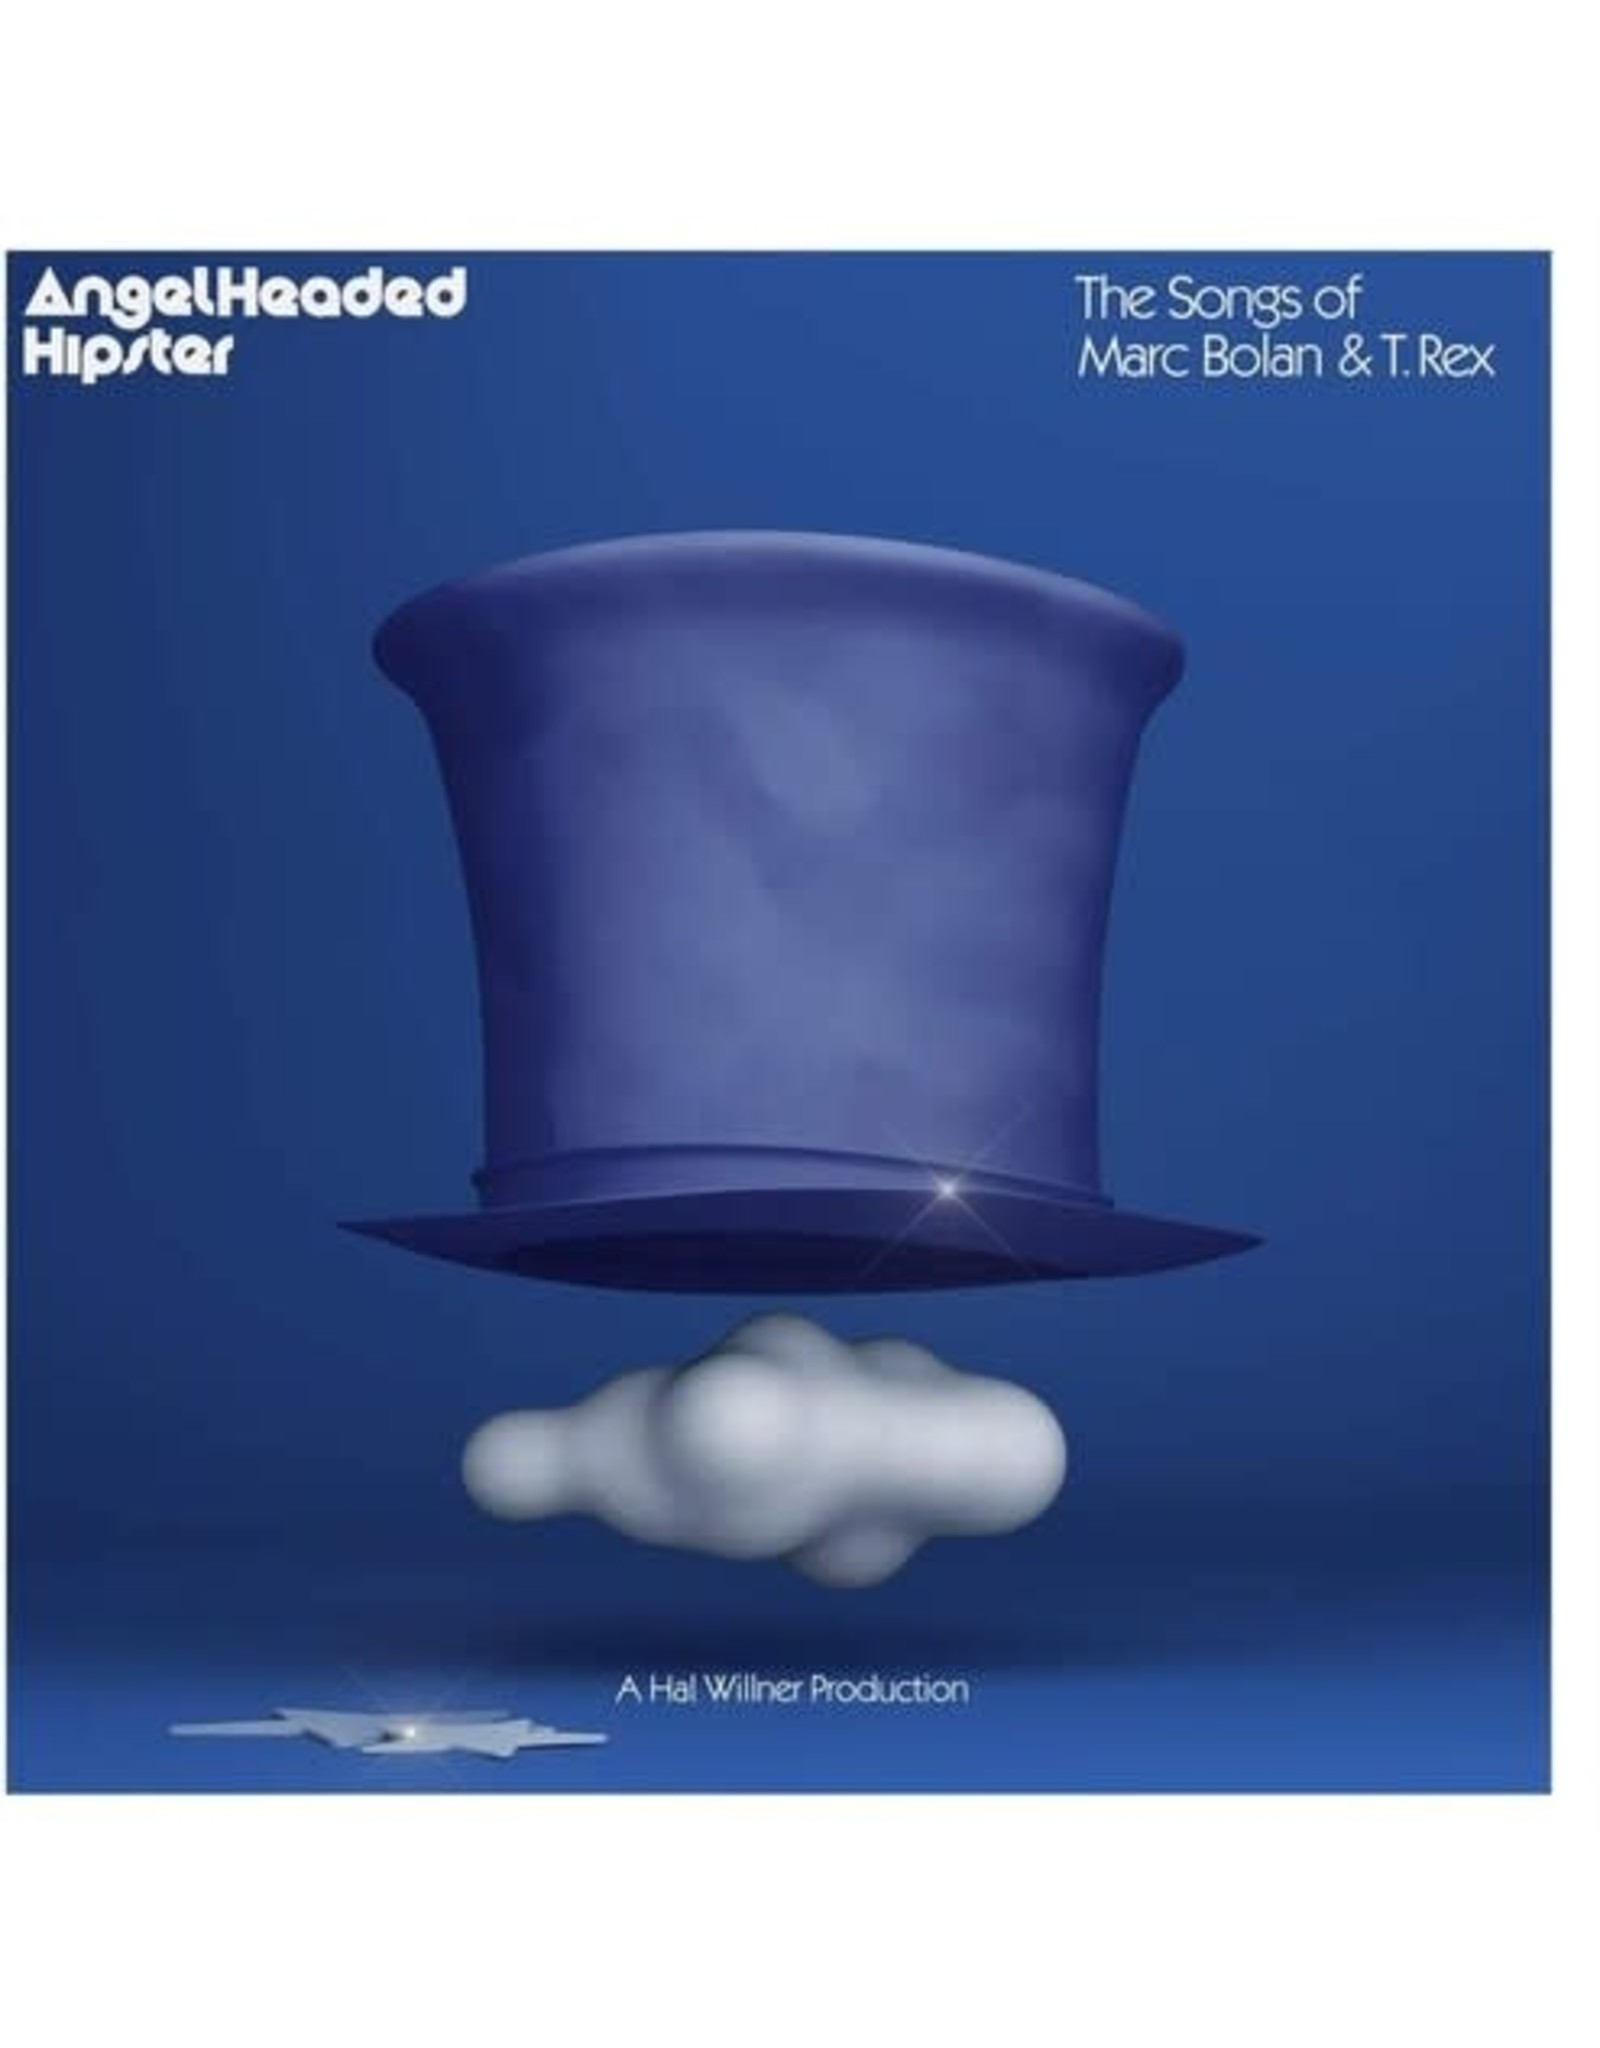 New Vinyl Various - Angelheaded Hipster: The Songs Of Marc Bolan & T. Rex 2LP